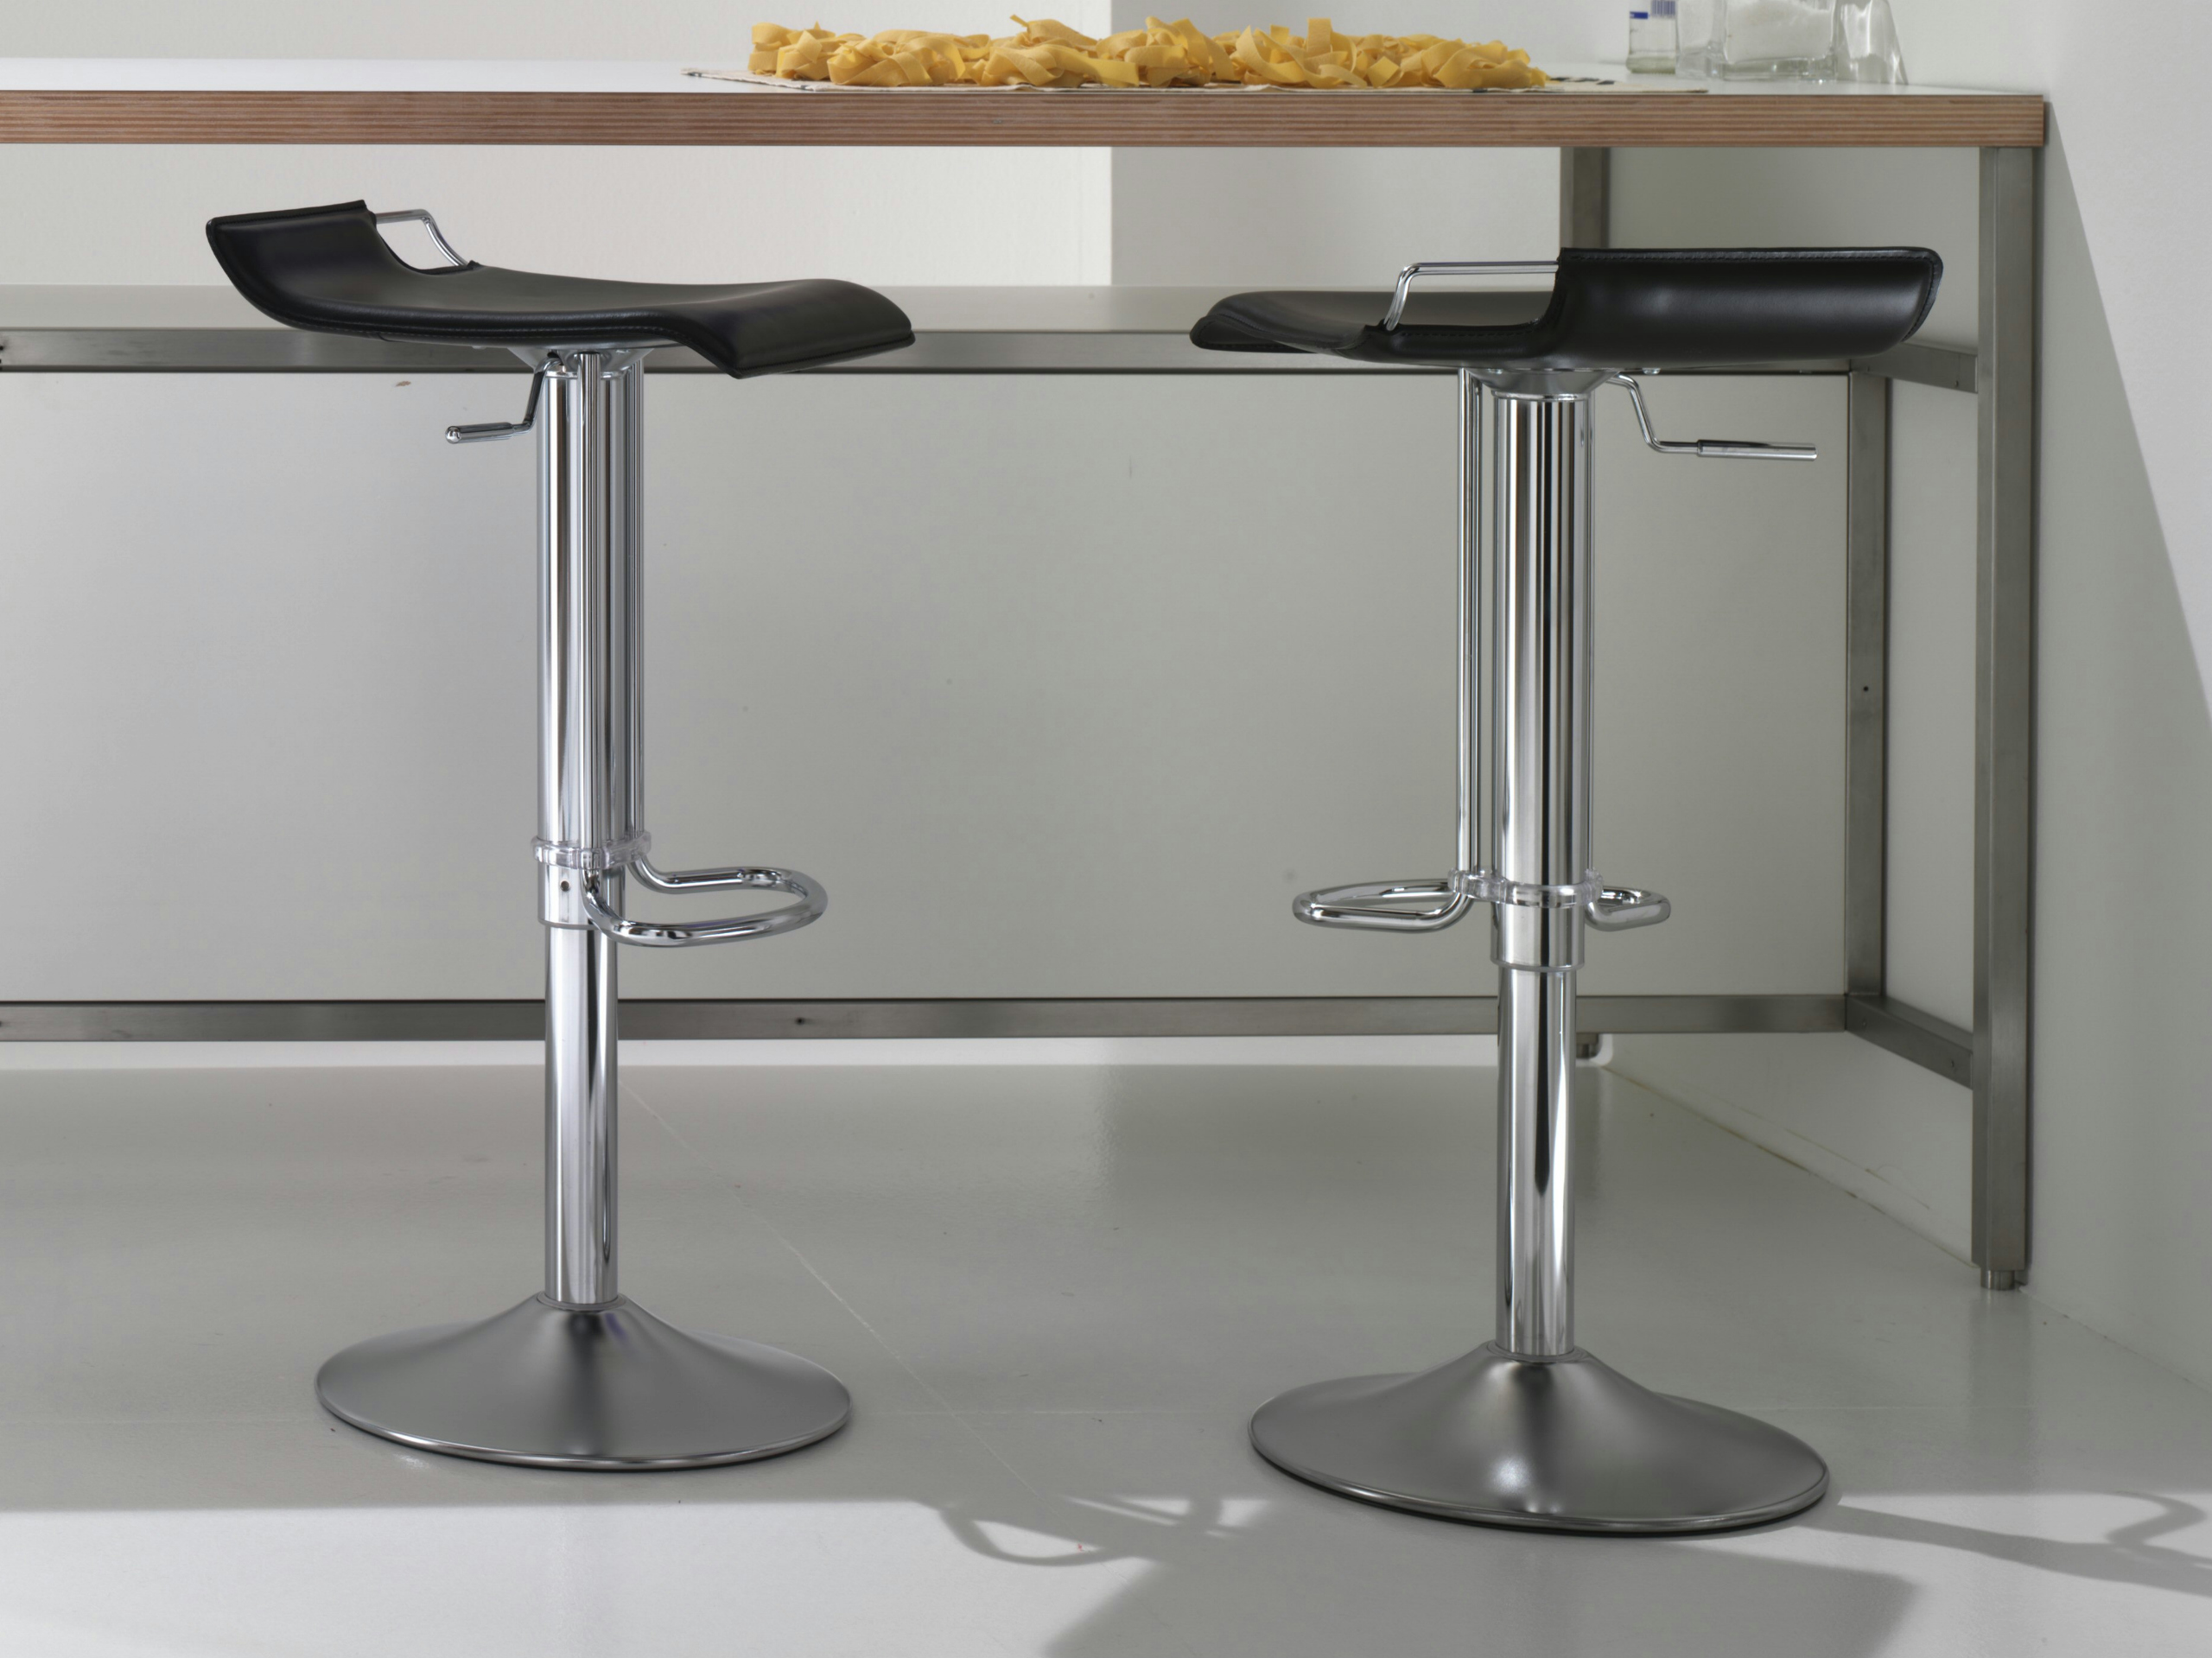 Tabouret r glable en hauteur hoppy by bonaldo design - Tabouret reglable en hauteur ...